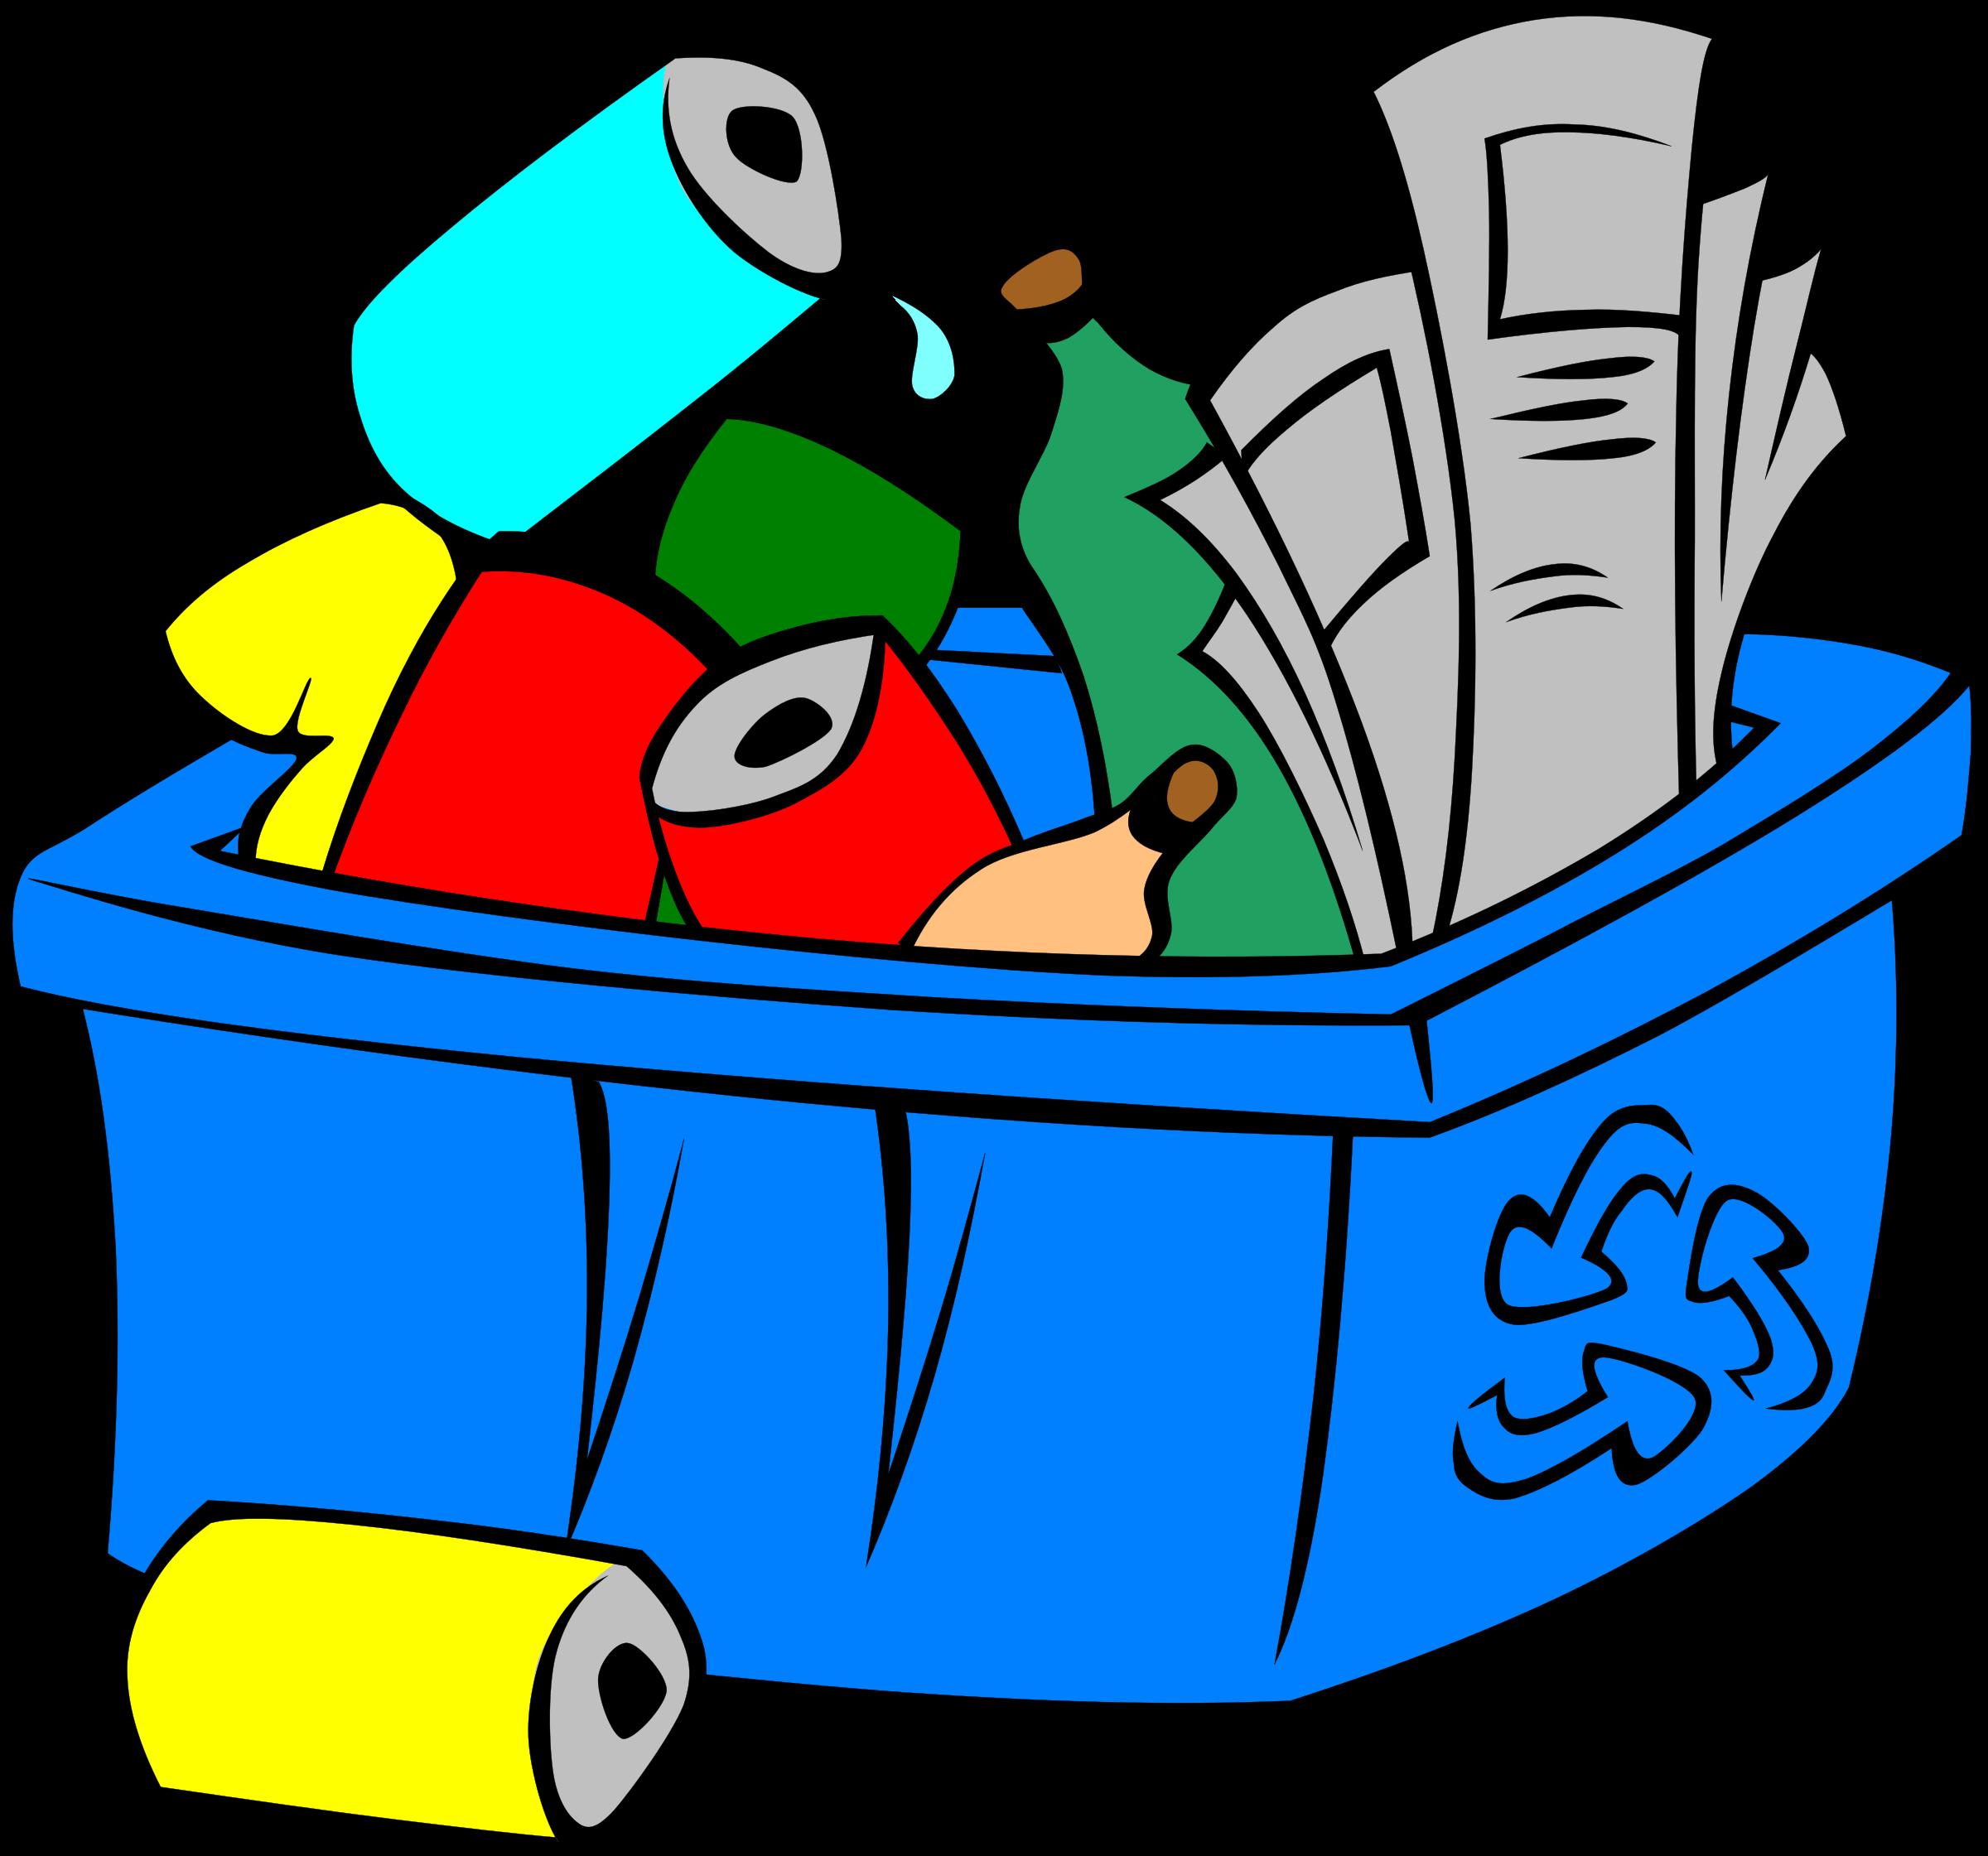 Recycling Bin Clip Art.